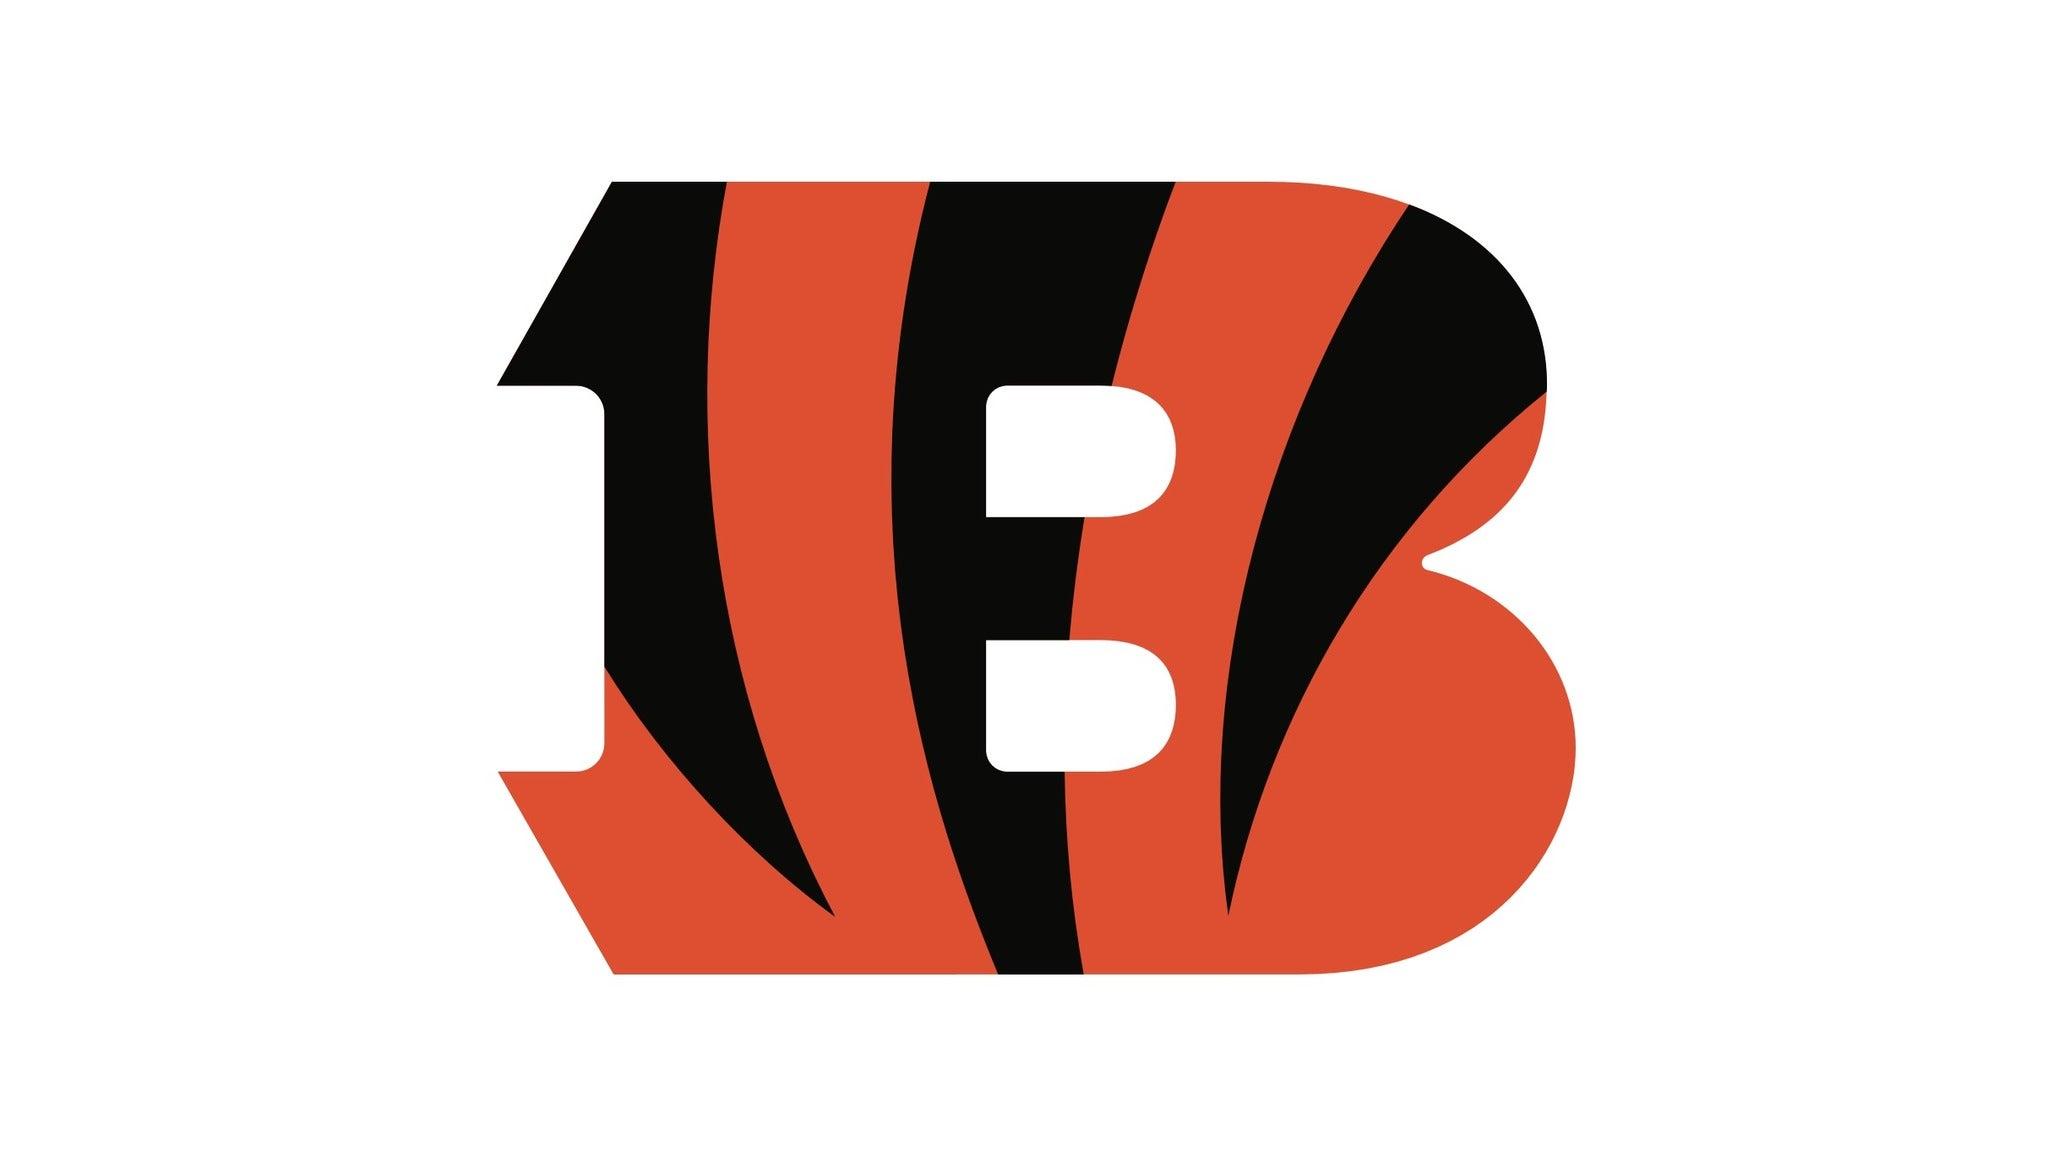 Cincinnati Bengals vs. Jacksonville Jaguars